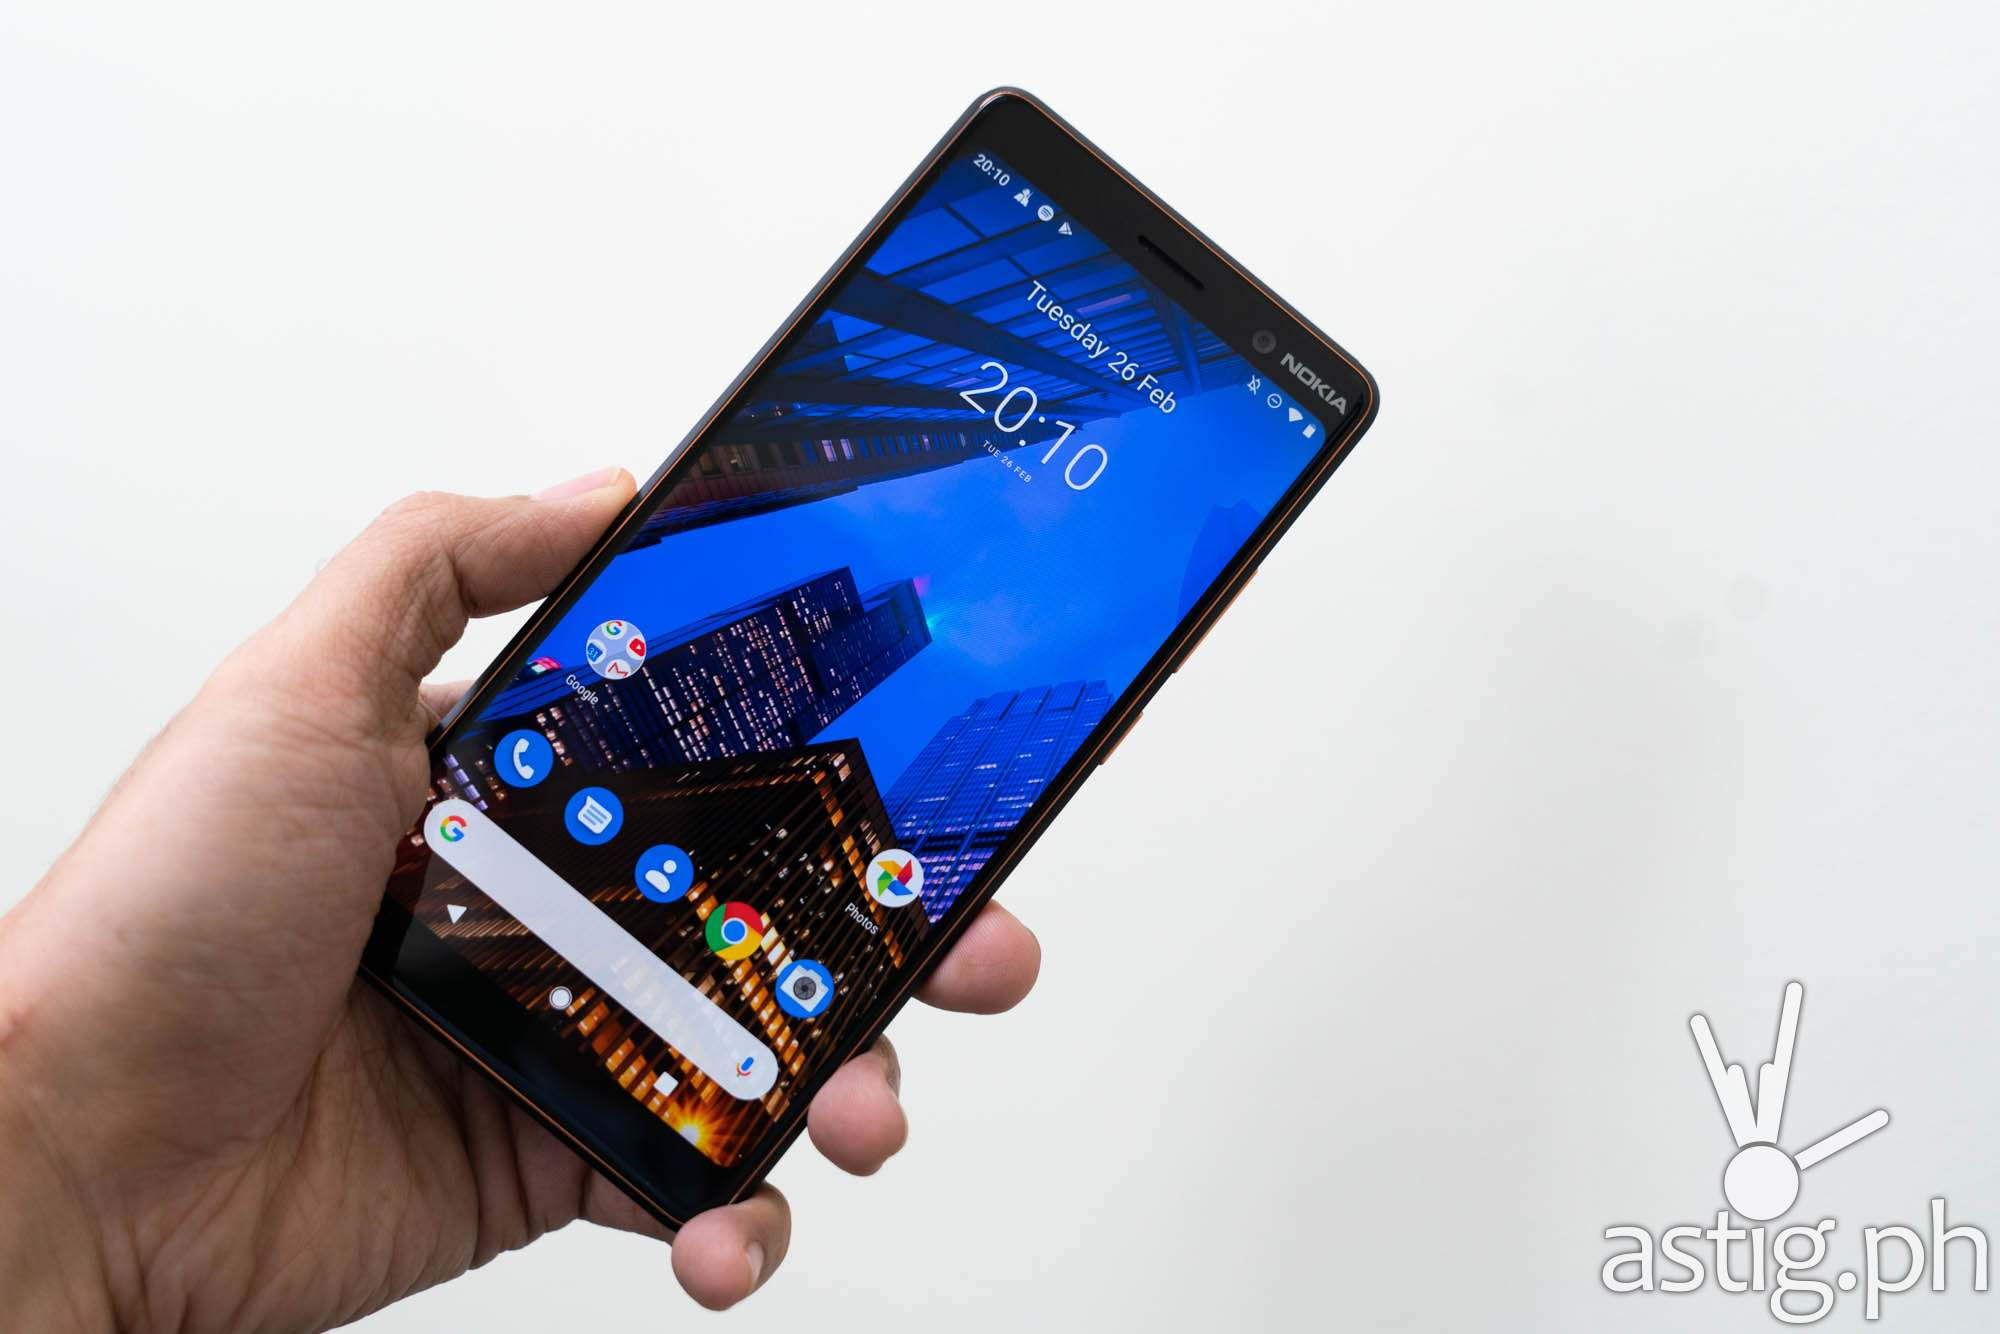 Front handheld - Nokia 7 Plus (Philippines)